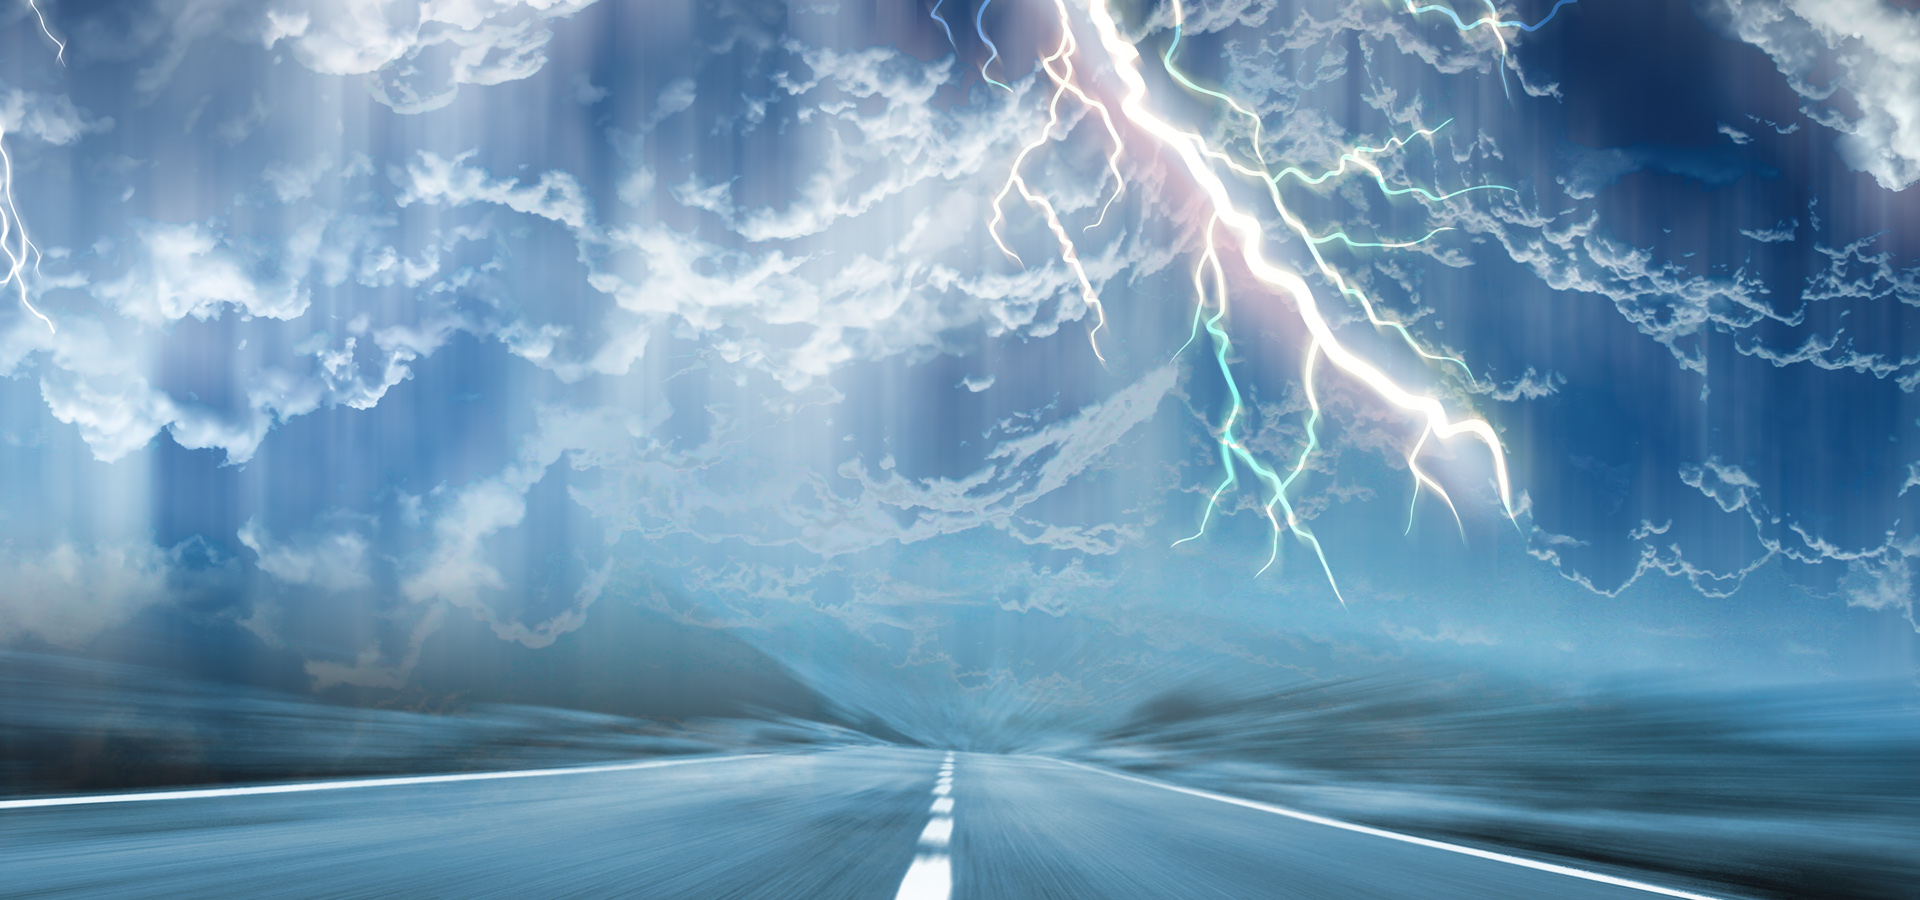 Thunder Background Photos Thunder Background Vectors And